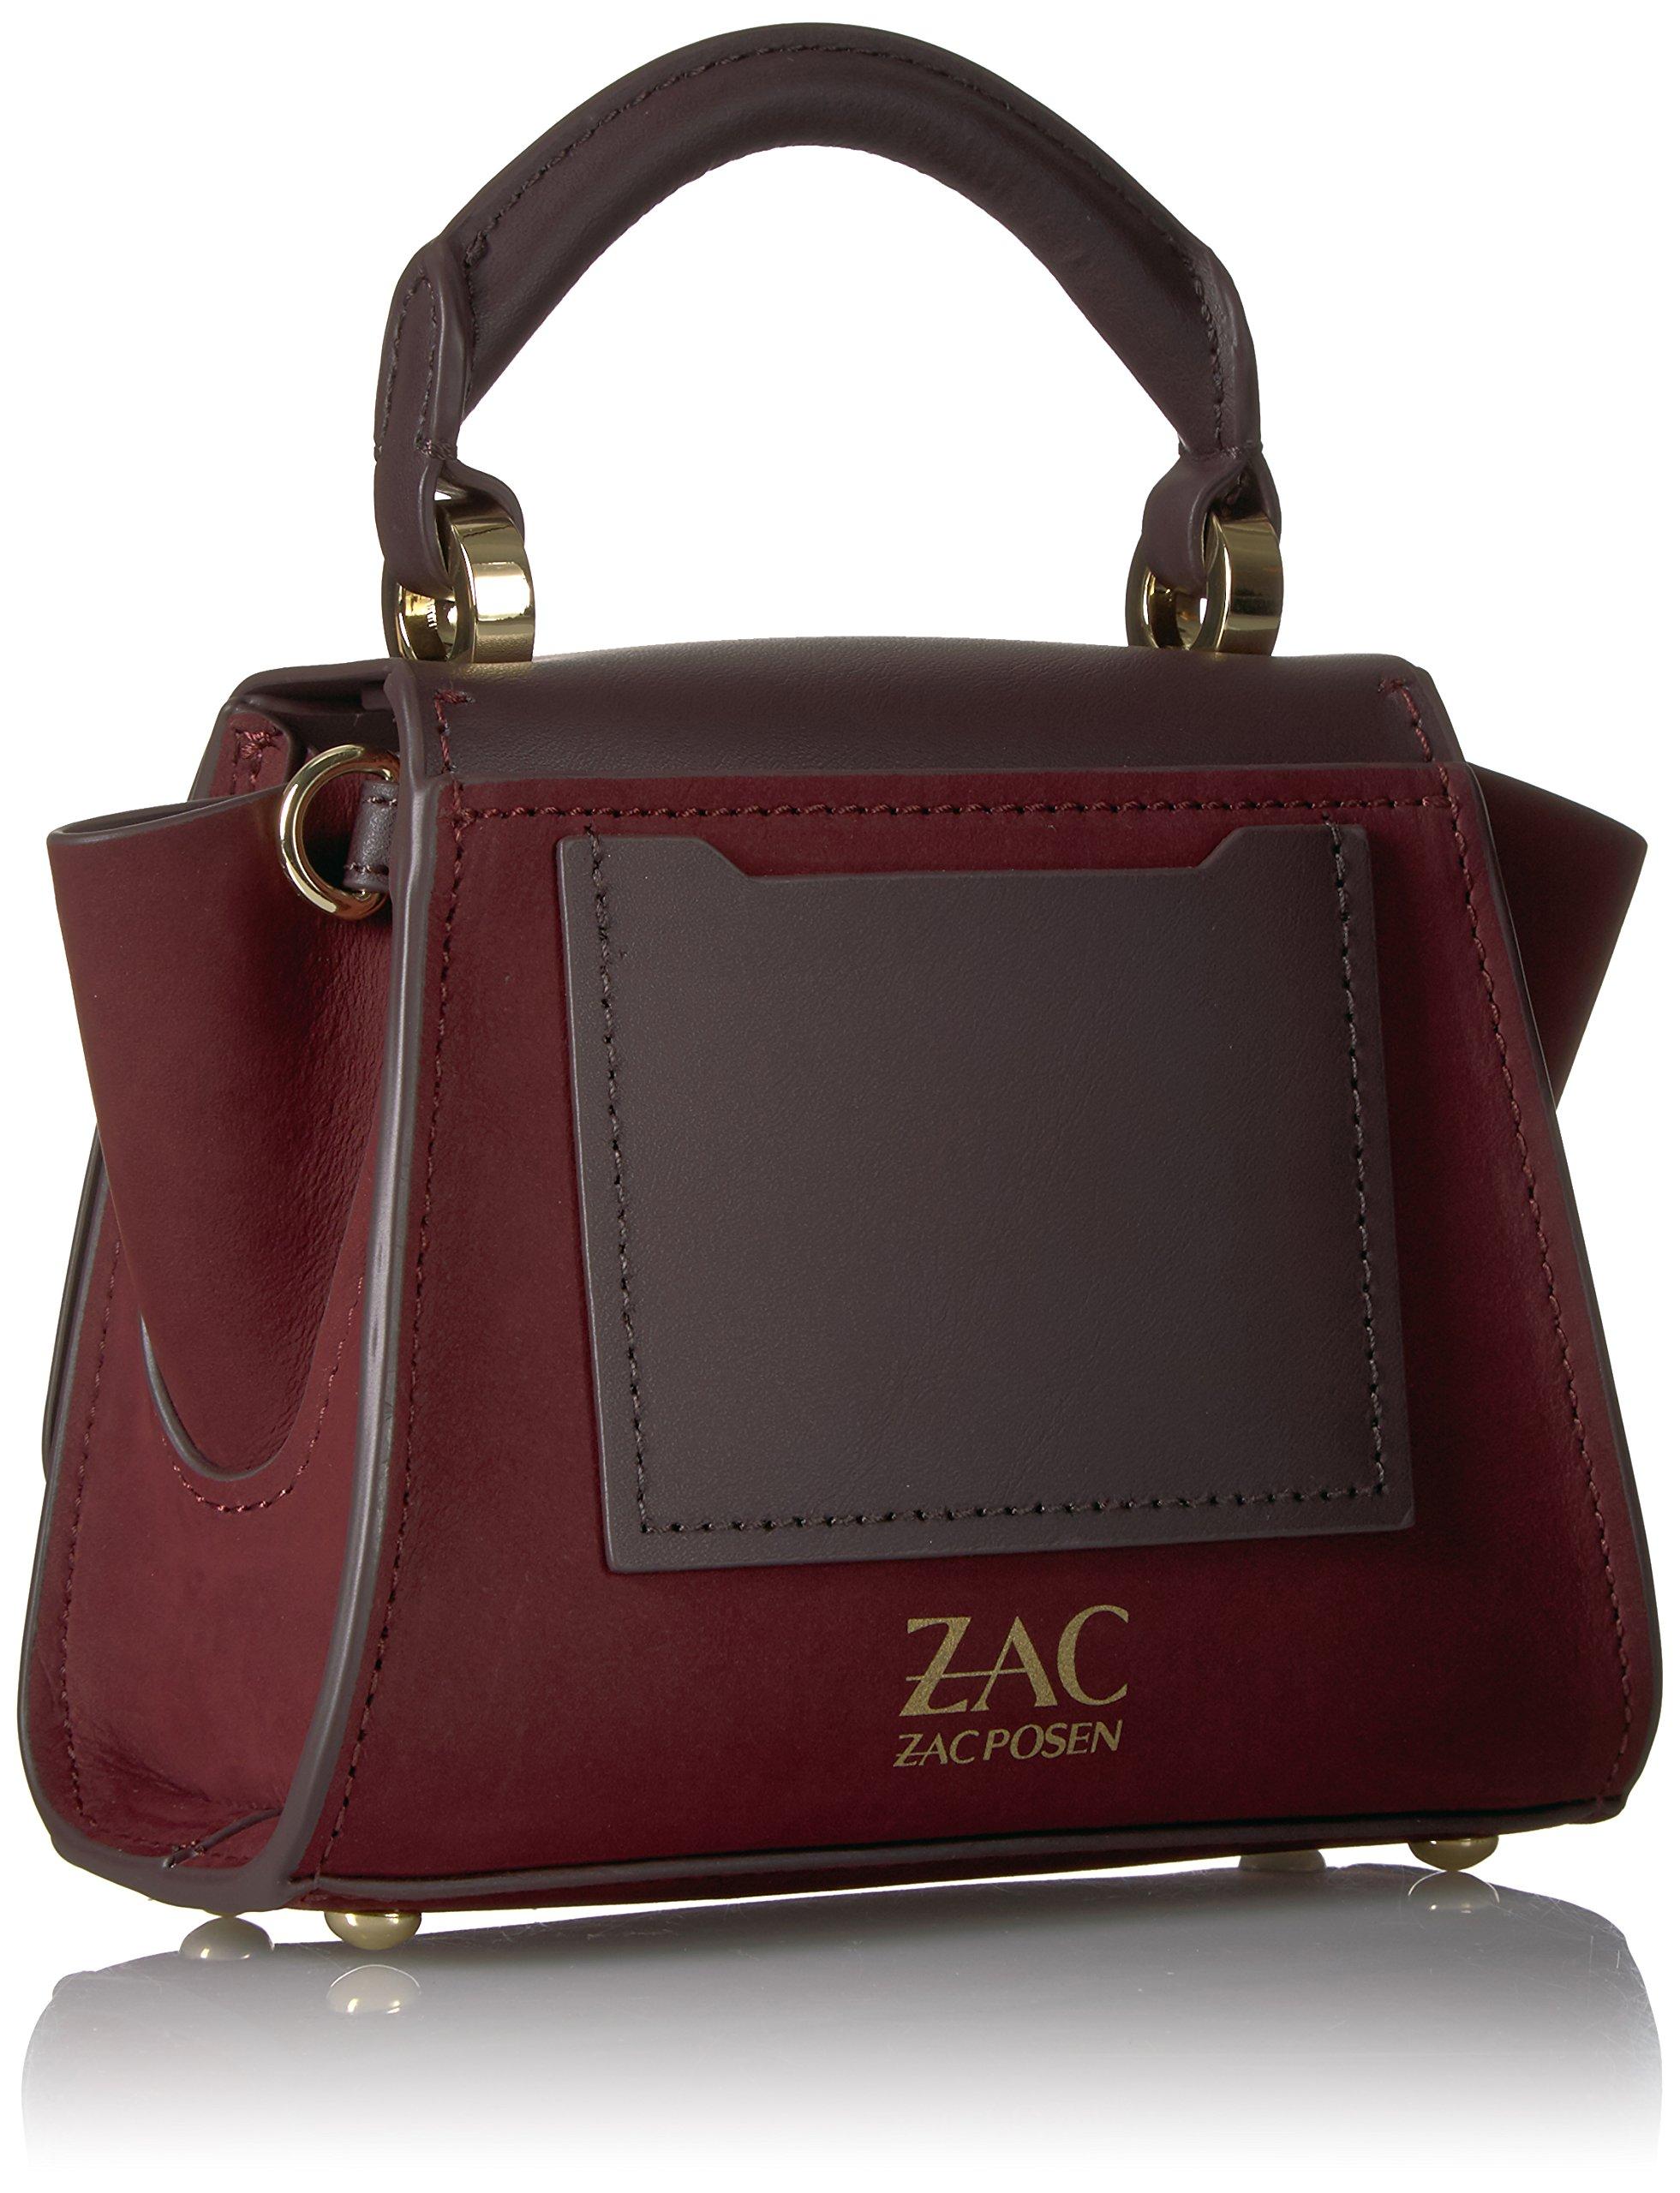 ZAC Zac Posen Eartha Iconic Soft Top Handle Mini-Suede by ZAC Zac Posen (Image #2)